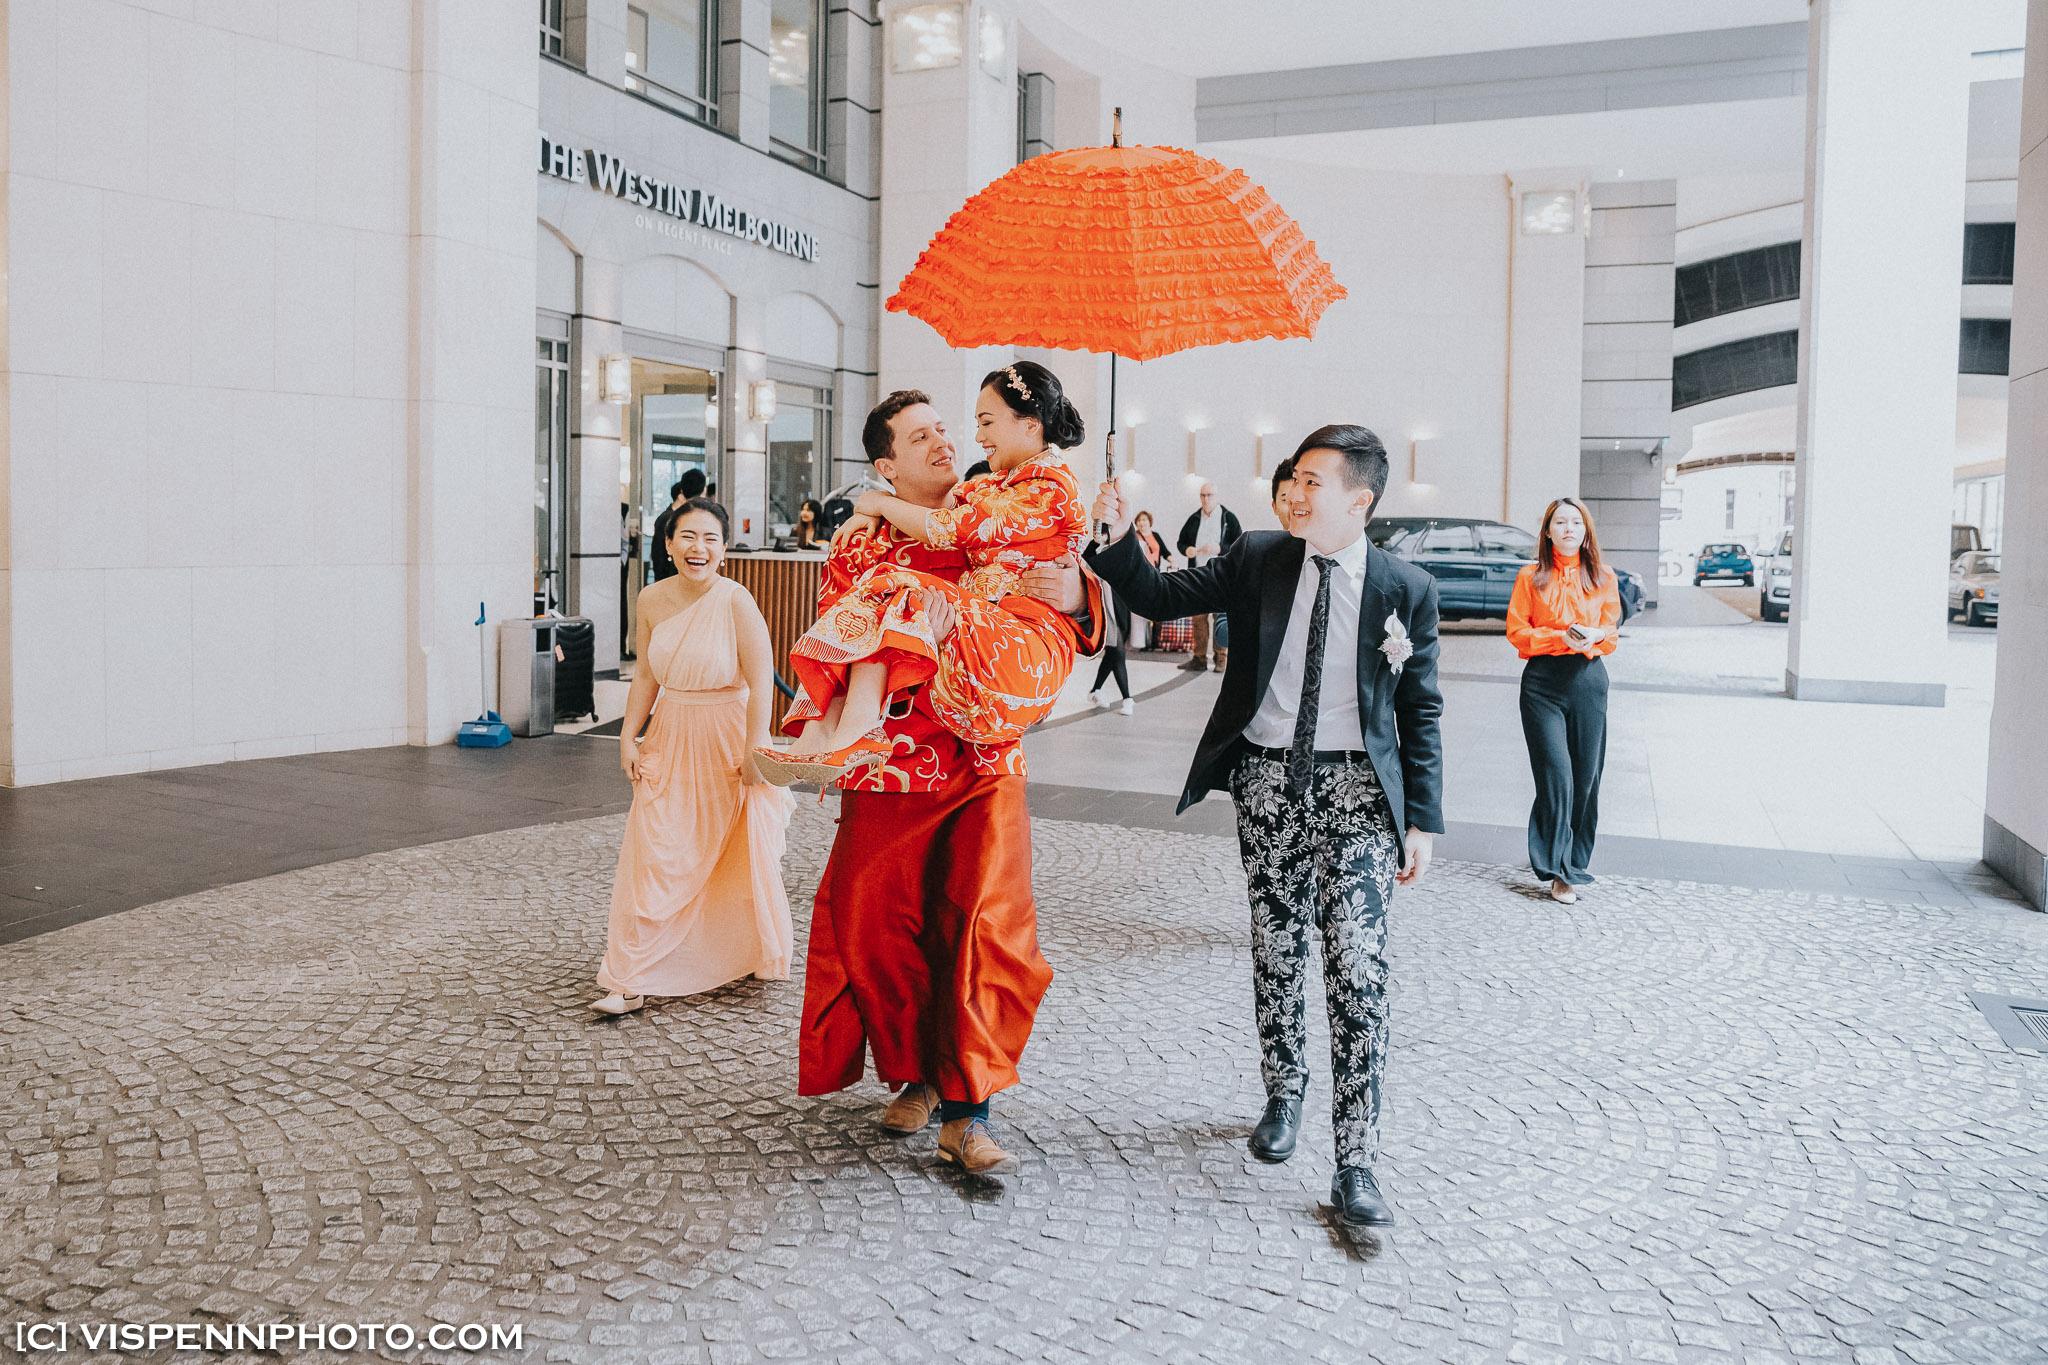 WEDDING DAY Photography Melbourne ZHPENN Kat P1 02964